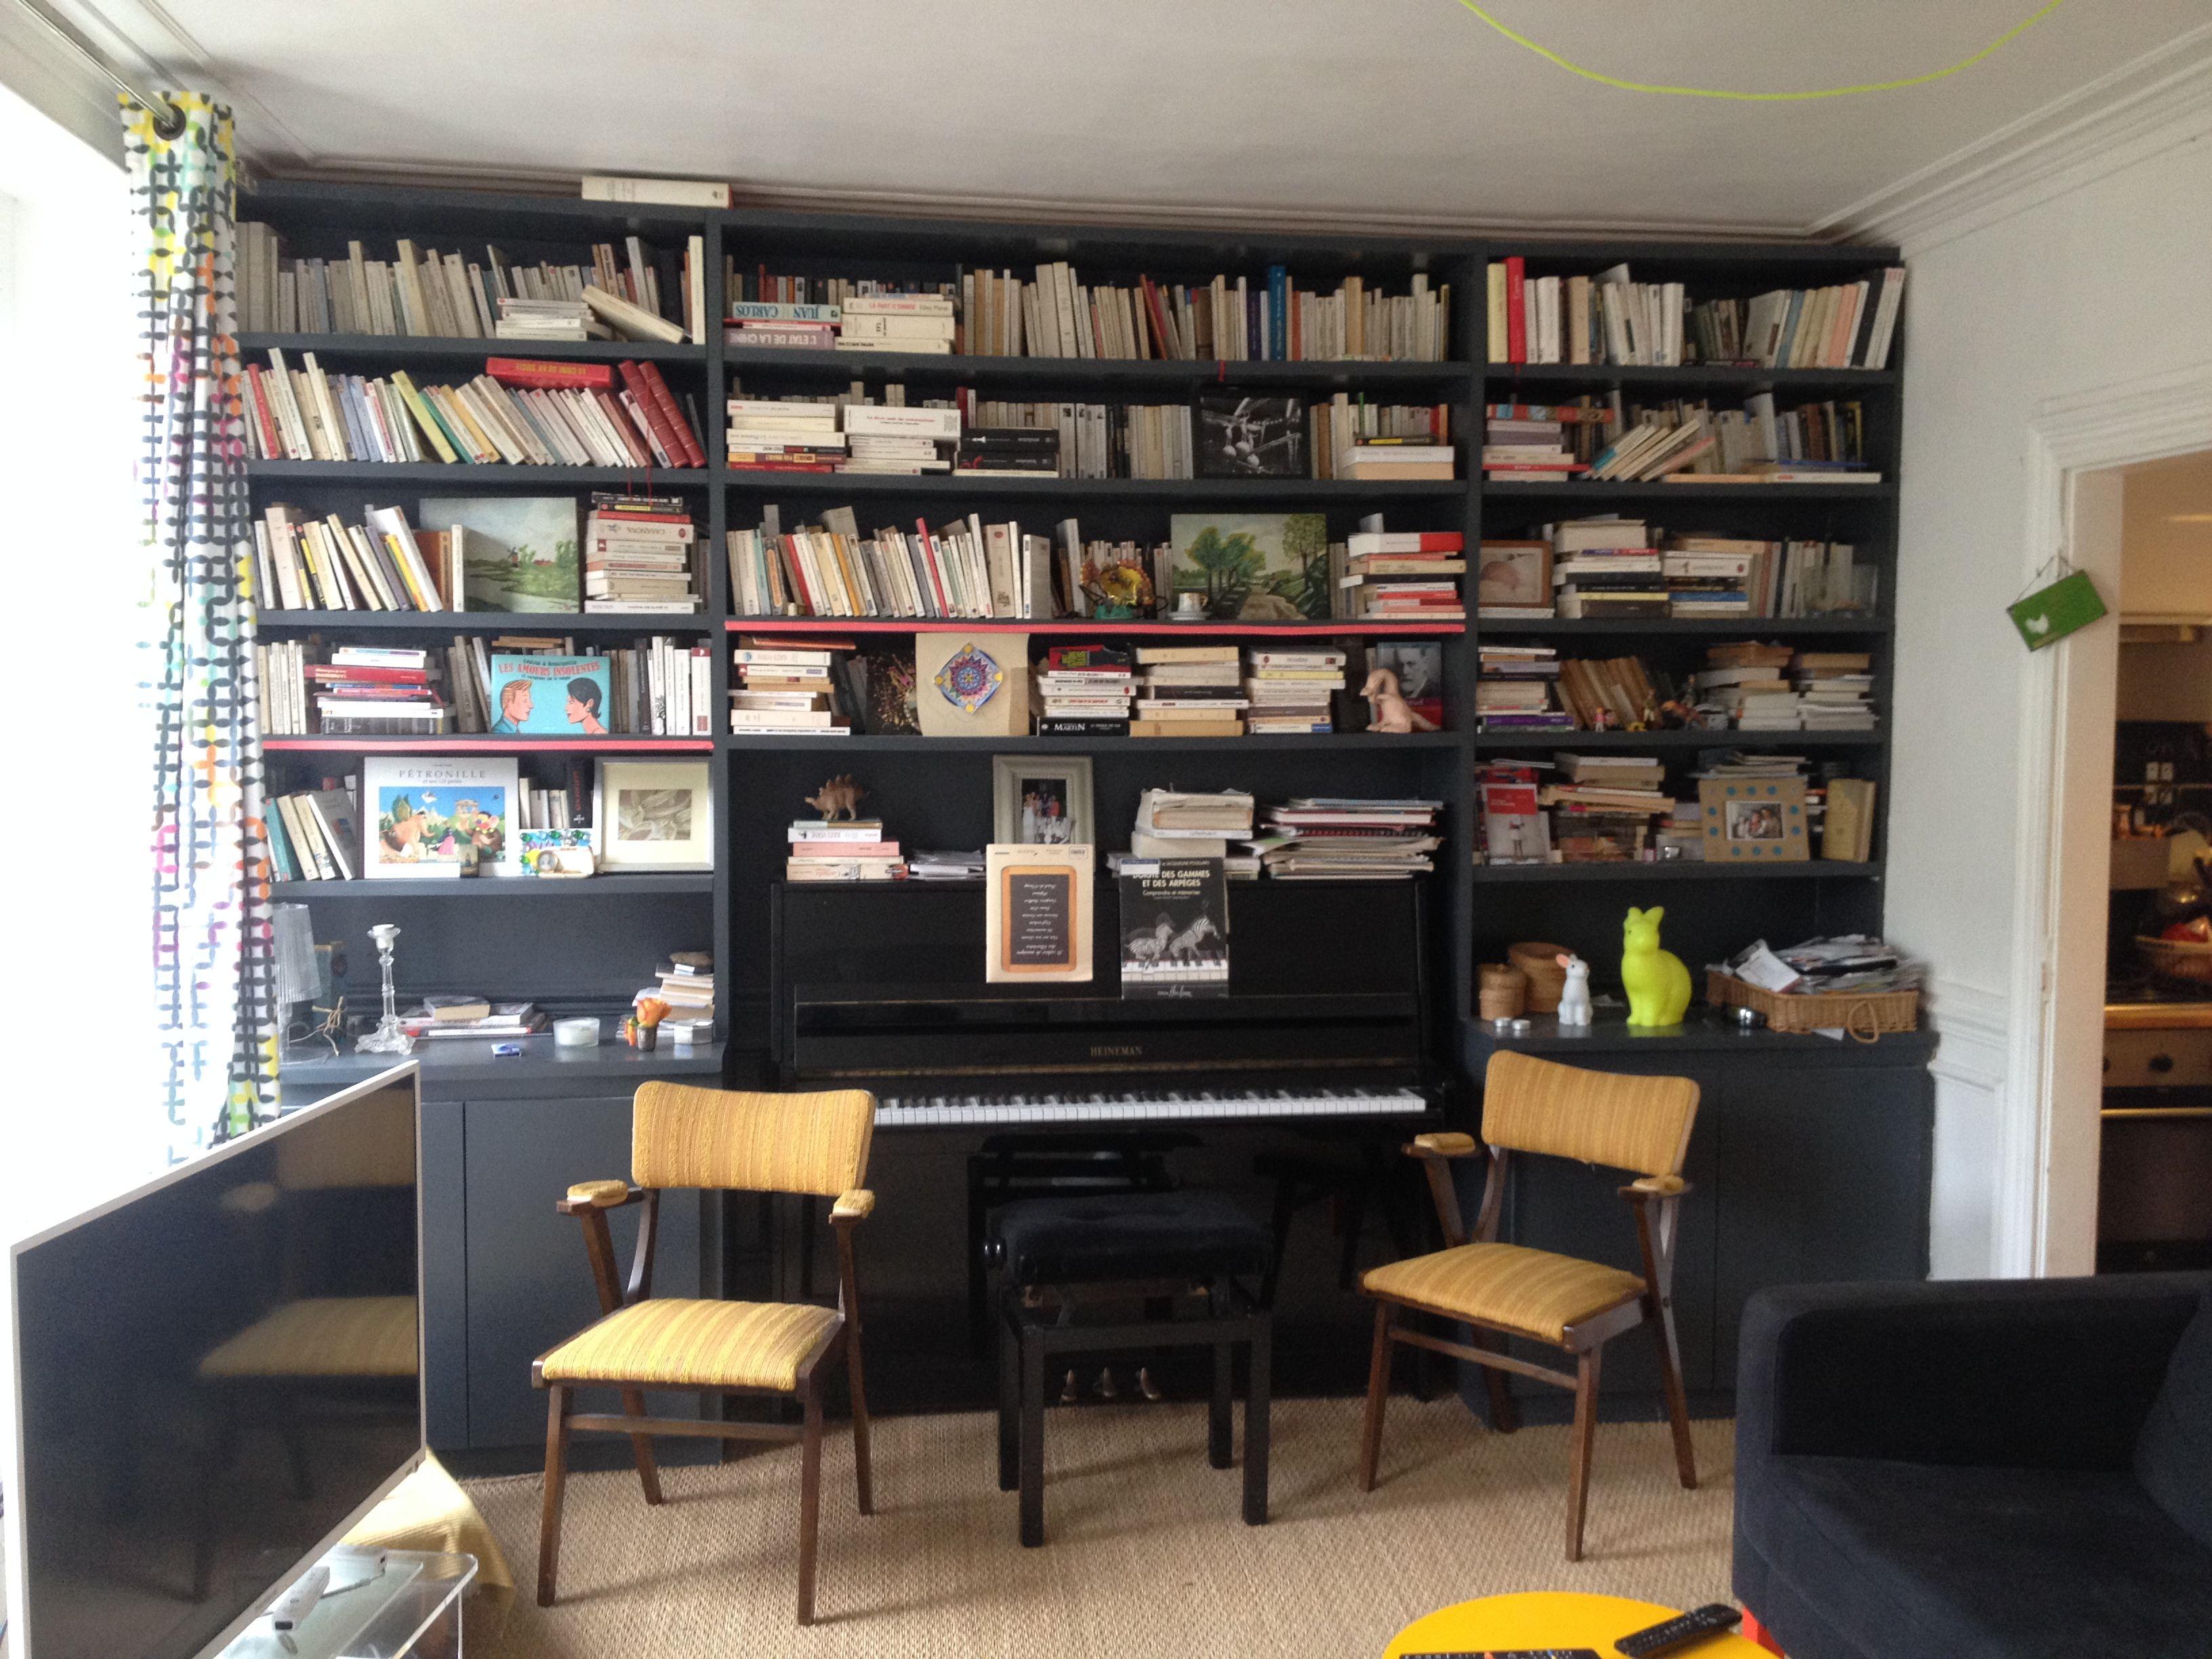 Www Judesetcollard Fr Meuble Bibliotheque Pour Piano Sur Mesure  # Bibliotheque Suspendue Pour Chambre